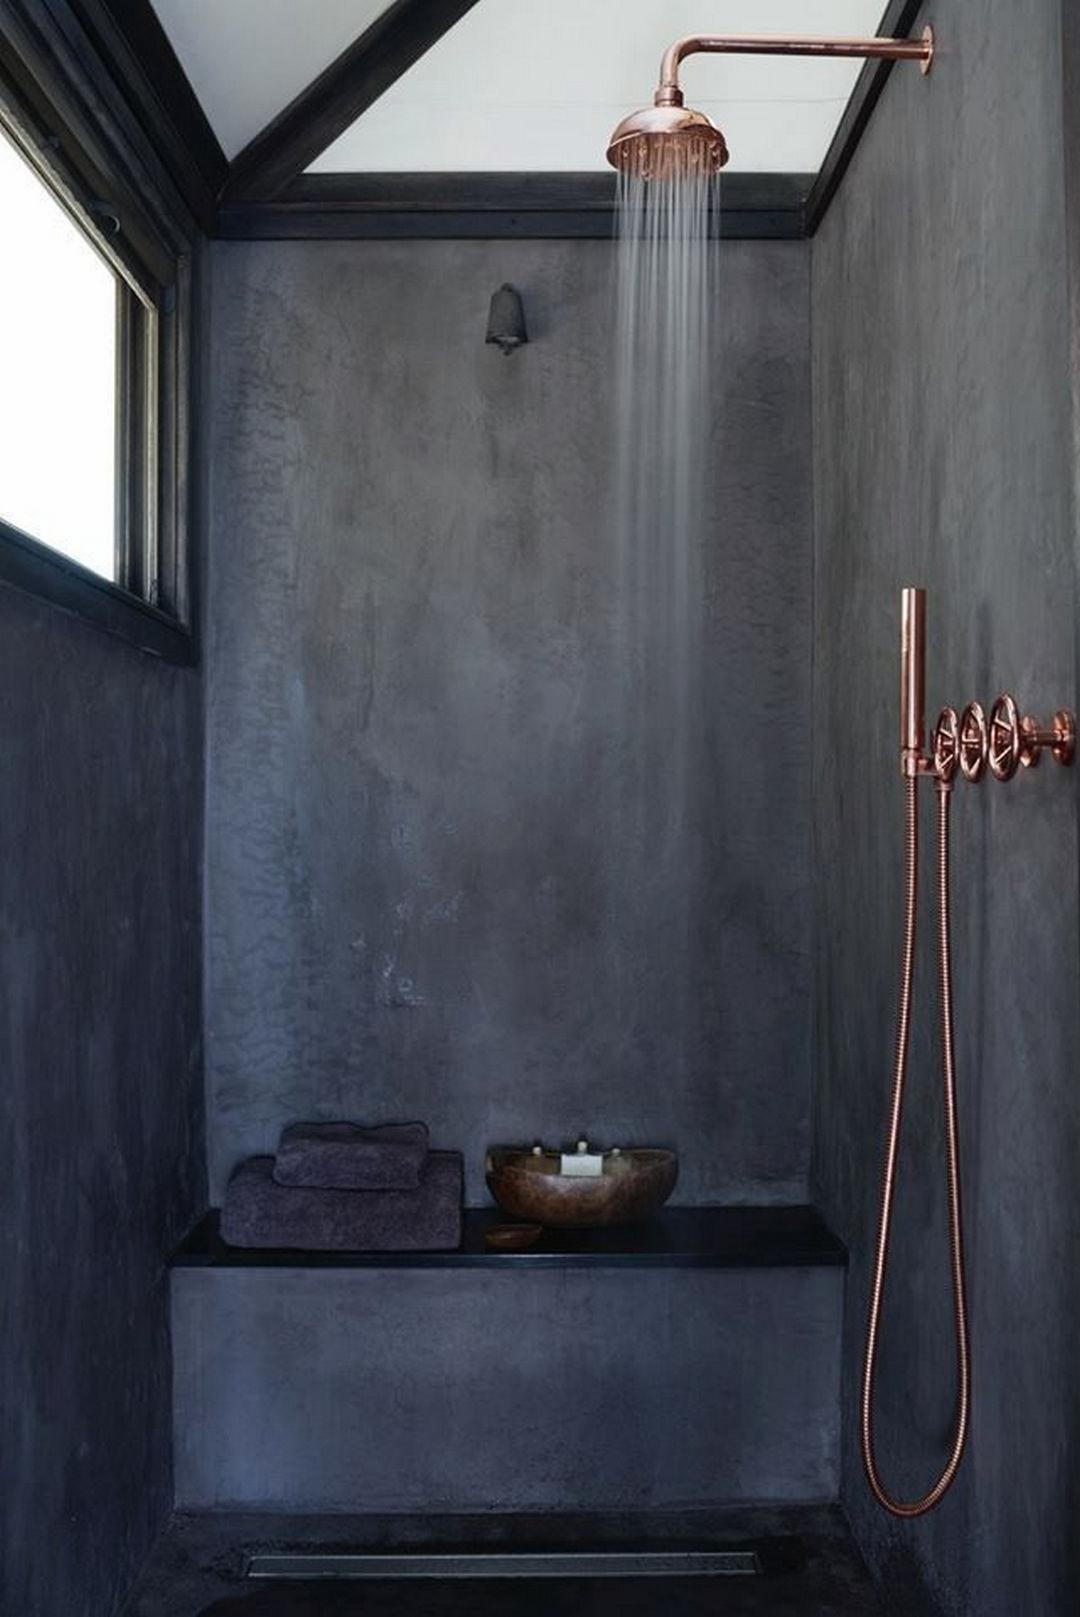 Modern Bathroom Interior Designs: 100 Fascinating Photos | Interiors ...